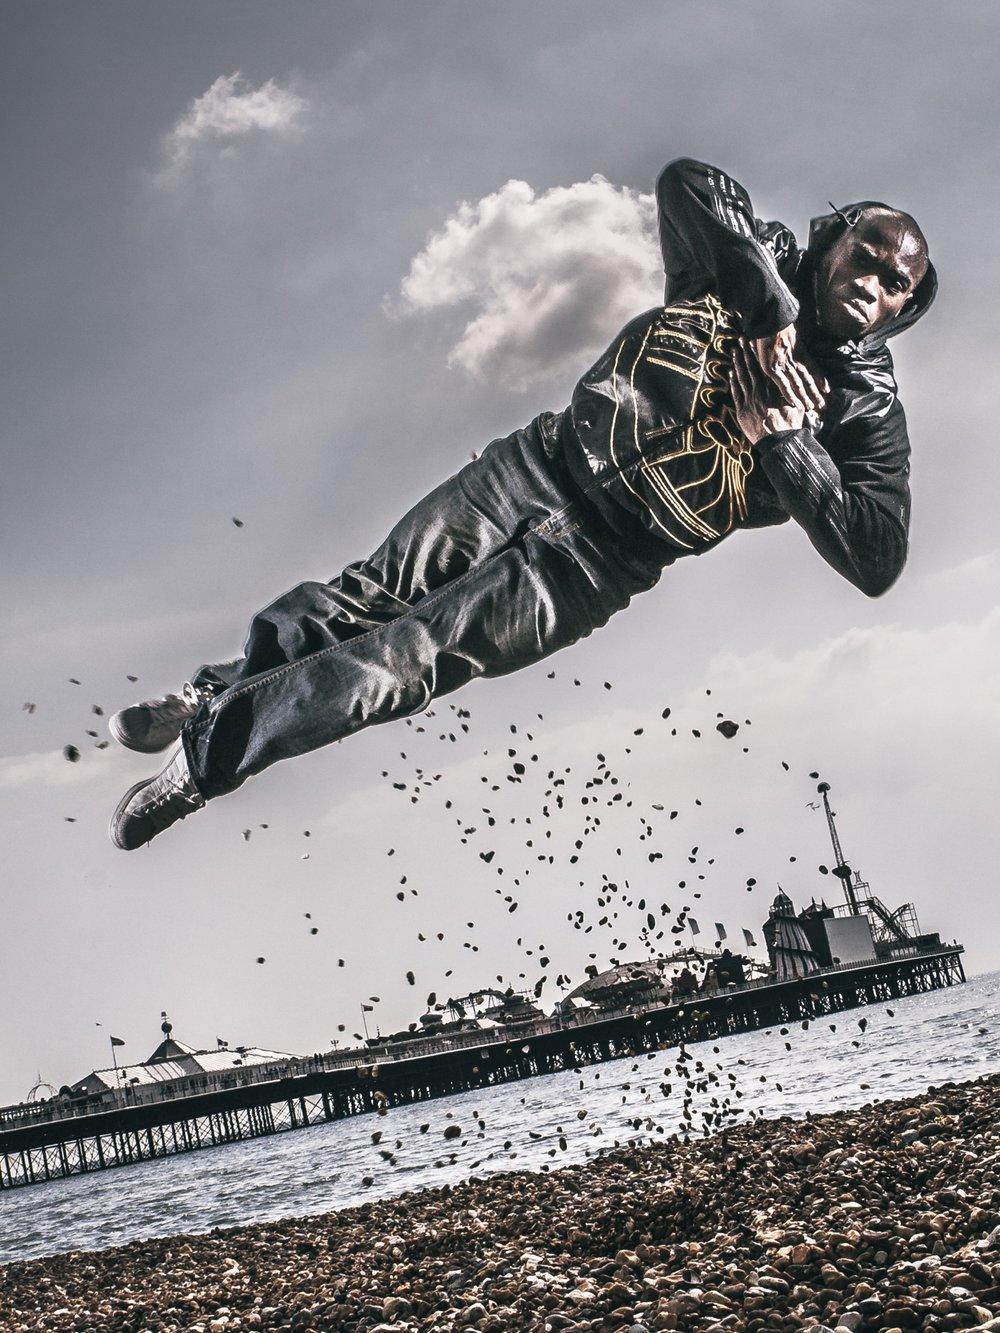 JP Omari Brighton Pier Photography Jumping Breakdancer Breakdance Jump Stones Award Winning Photo